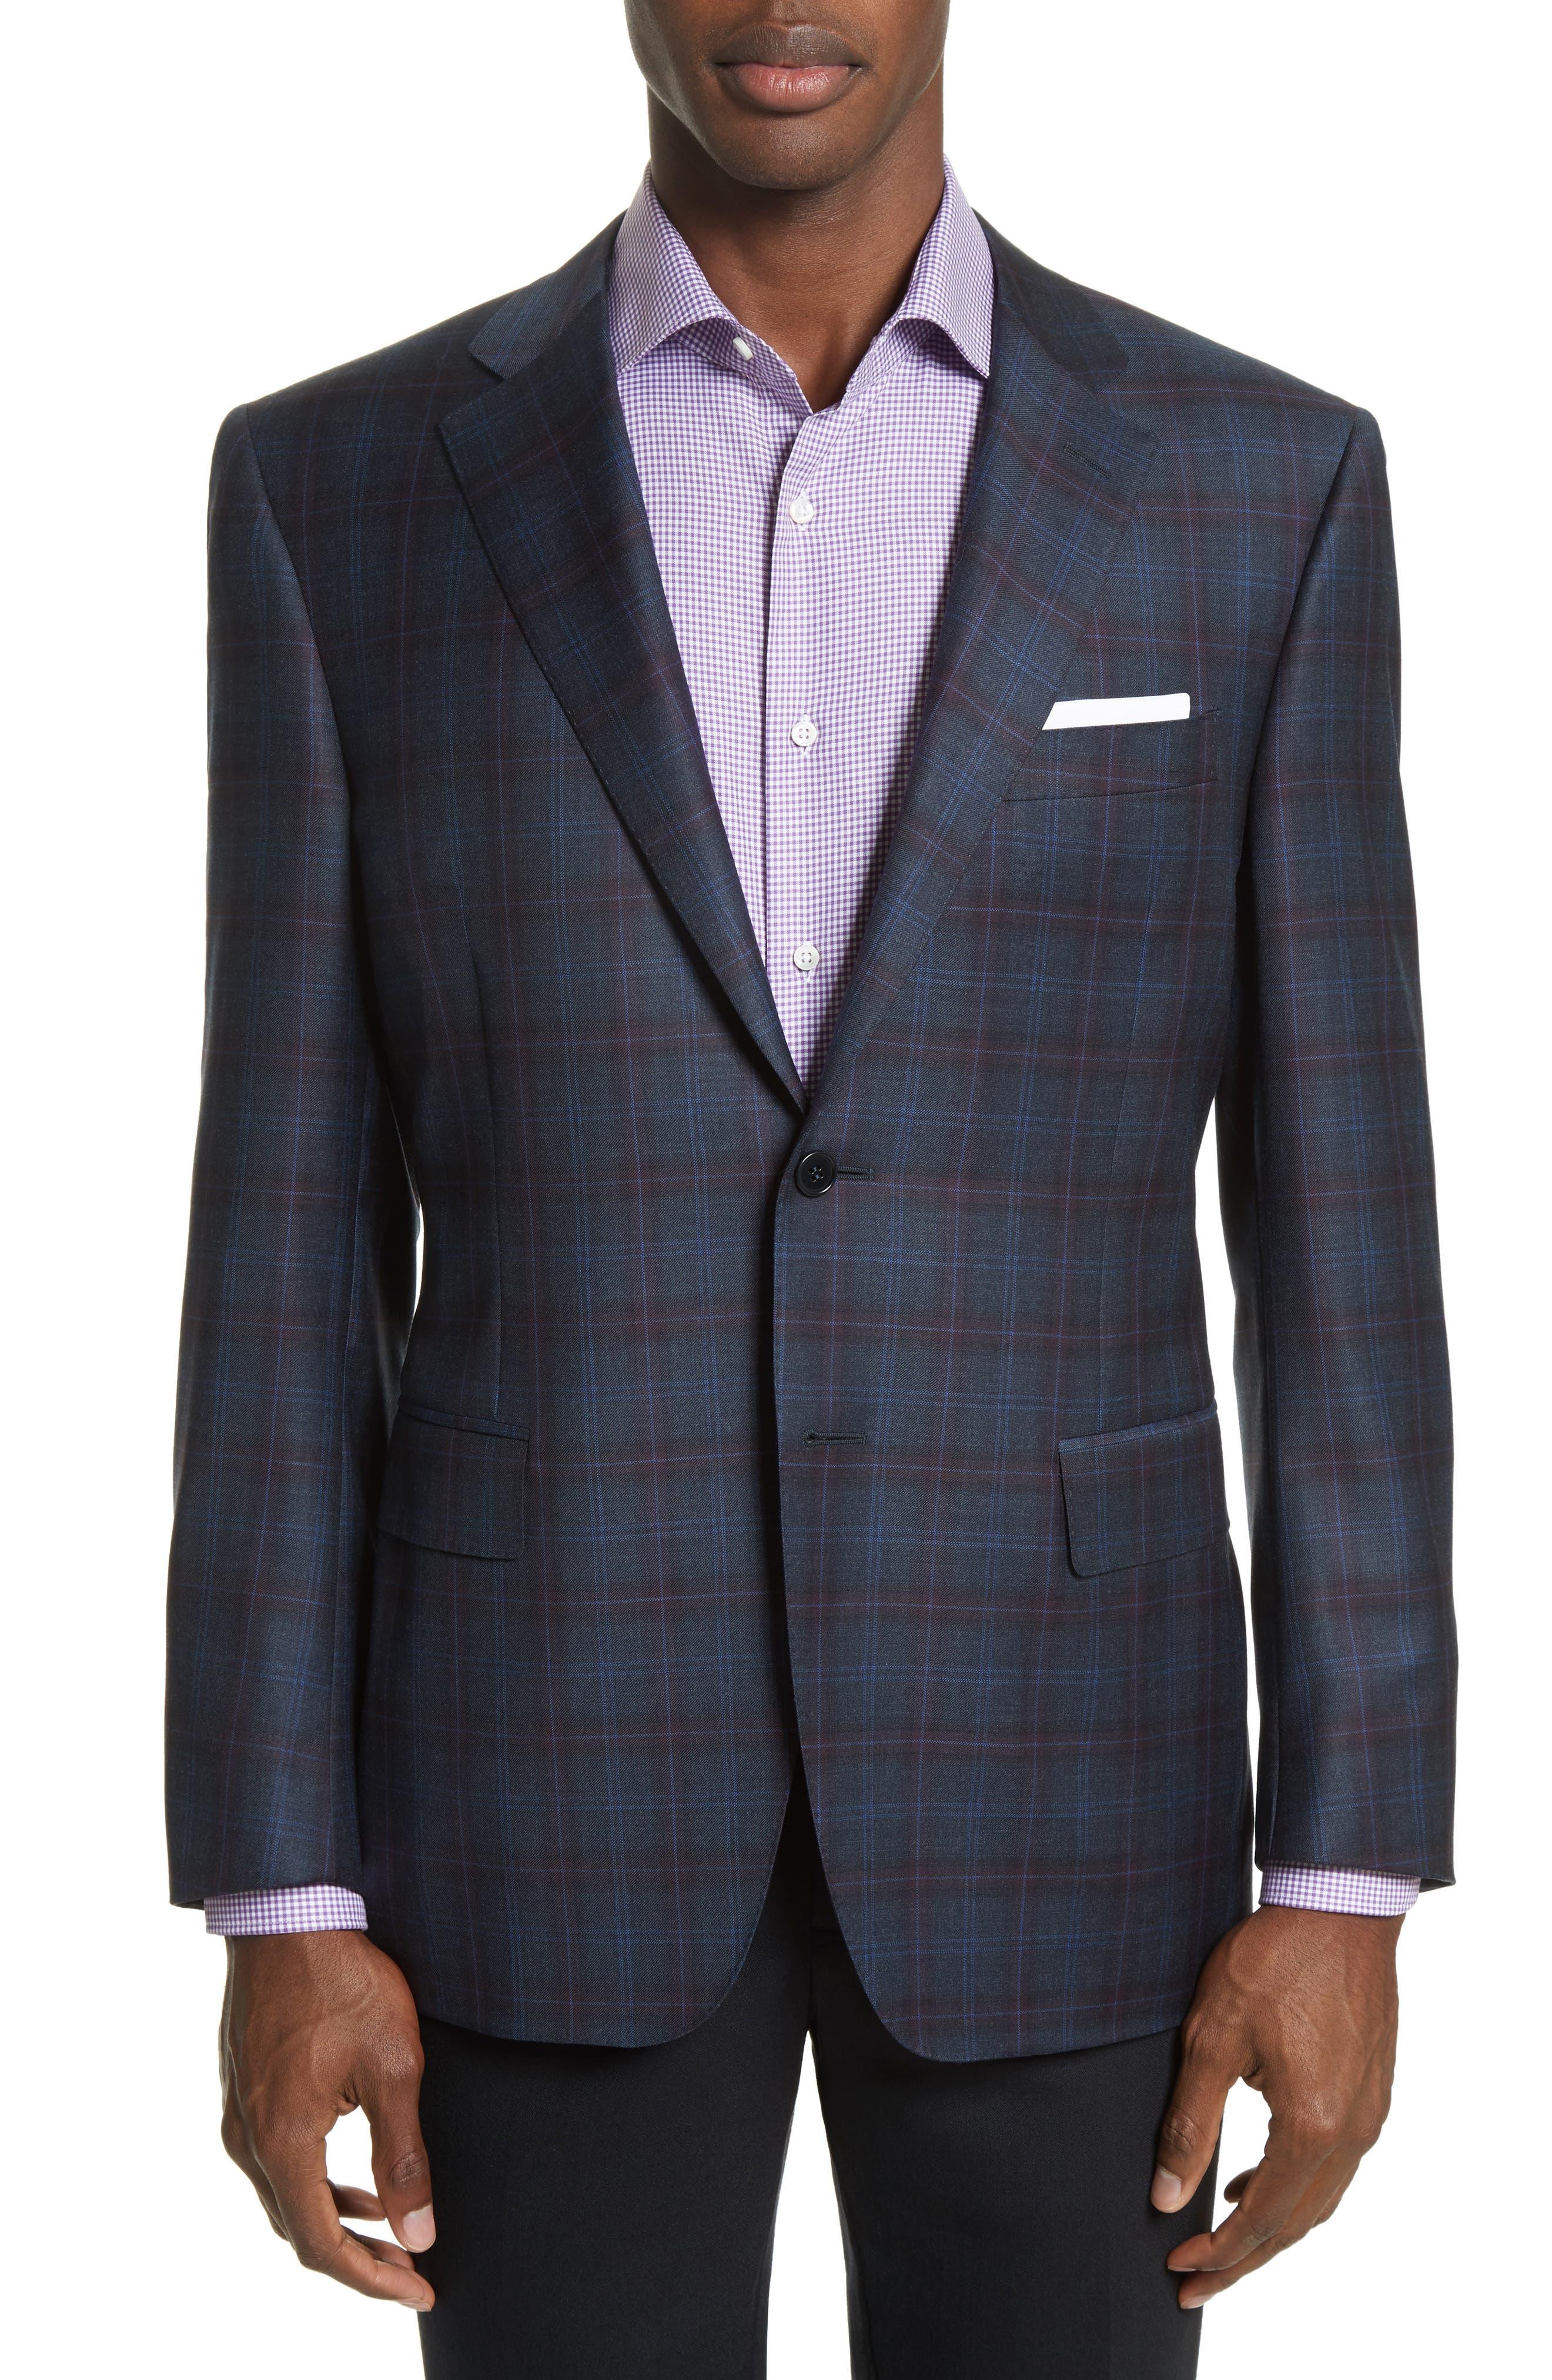 Main Image - Canali Kei Classic Fit Plaid Wool Sport Coat